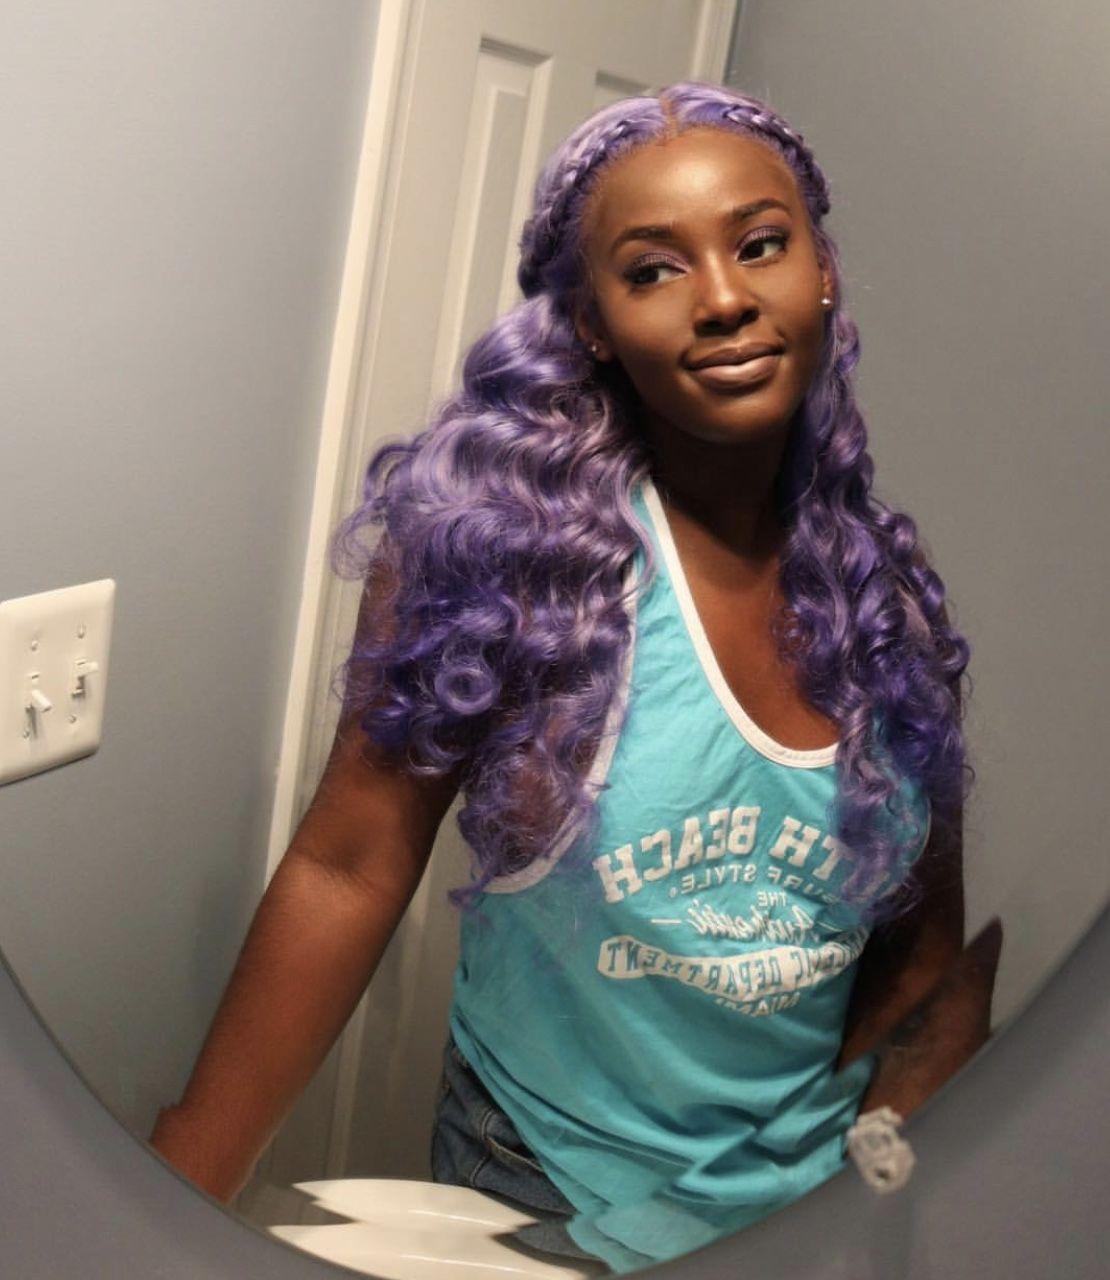 Idea By Fadedwigbae On Tooblackforwhat Purple Hair Black Girl